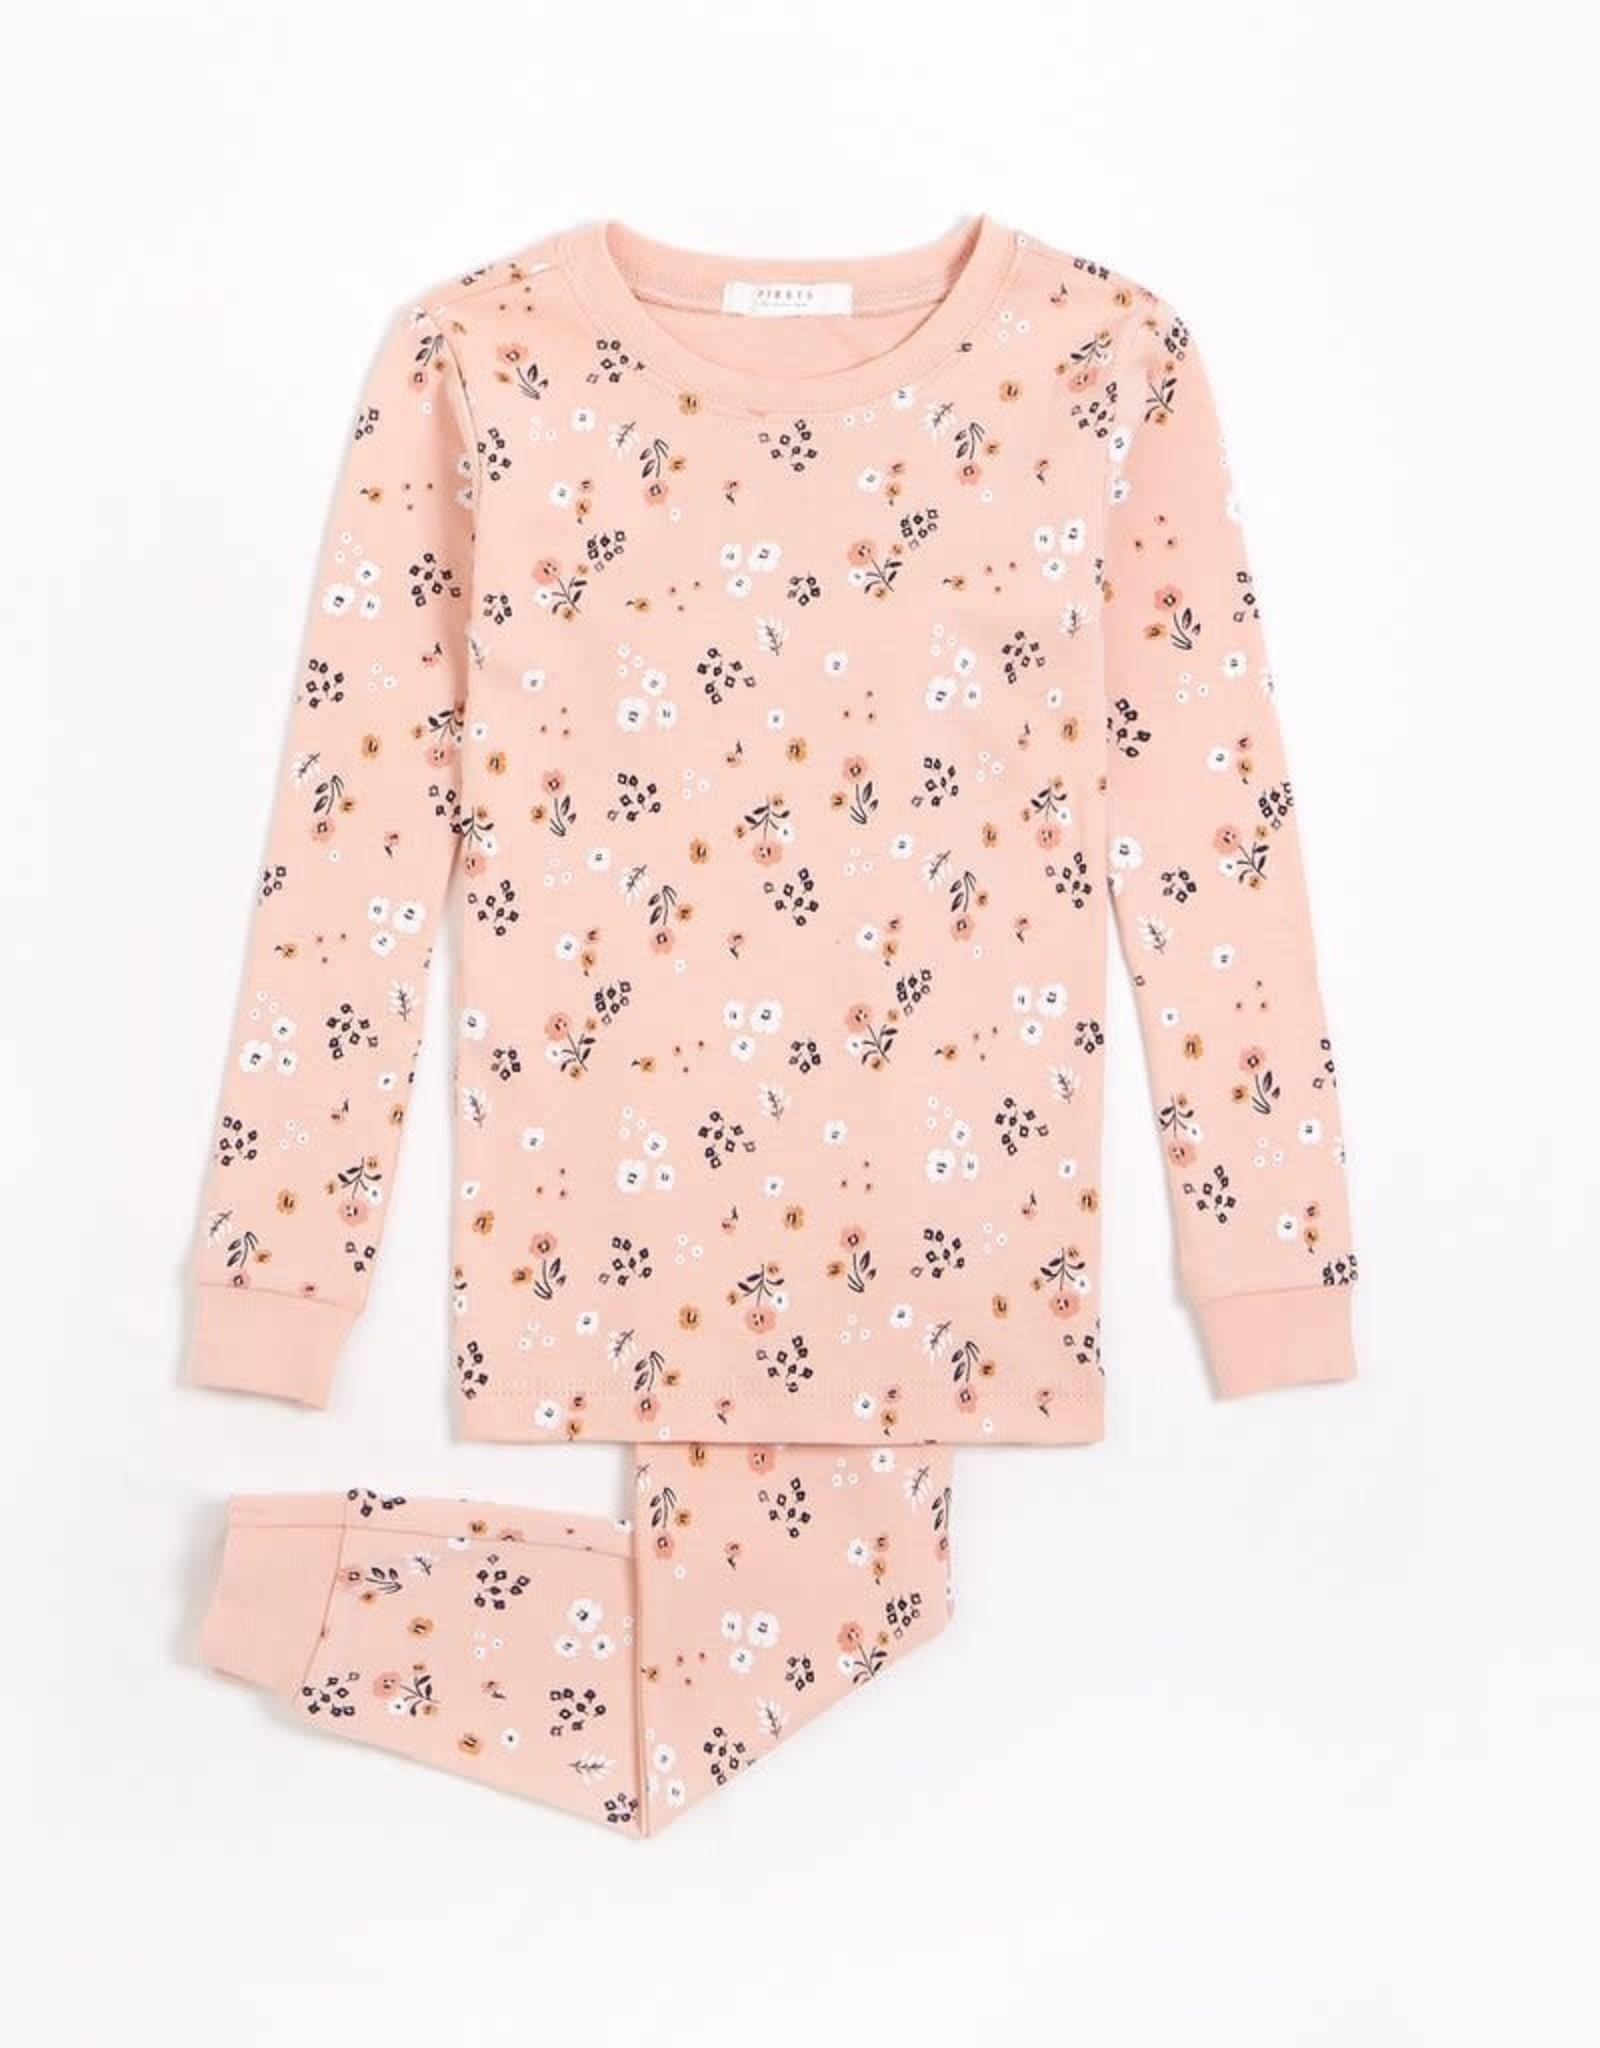 Petit Lem Petit Lem Toddler 2pc Pj Set L/S Top + Pants Pink Farmland Floral Pink